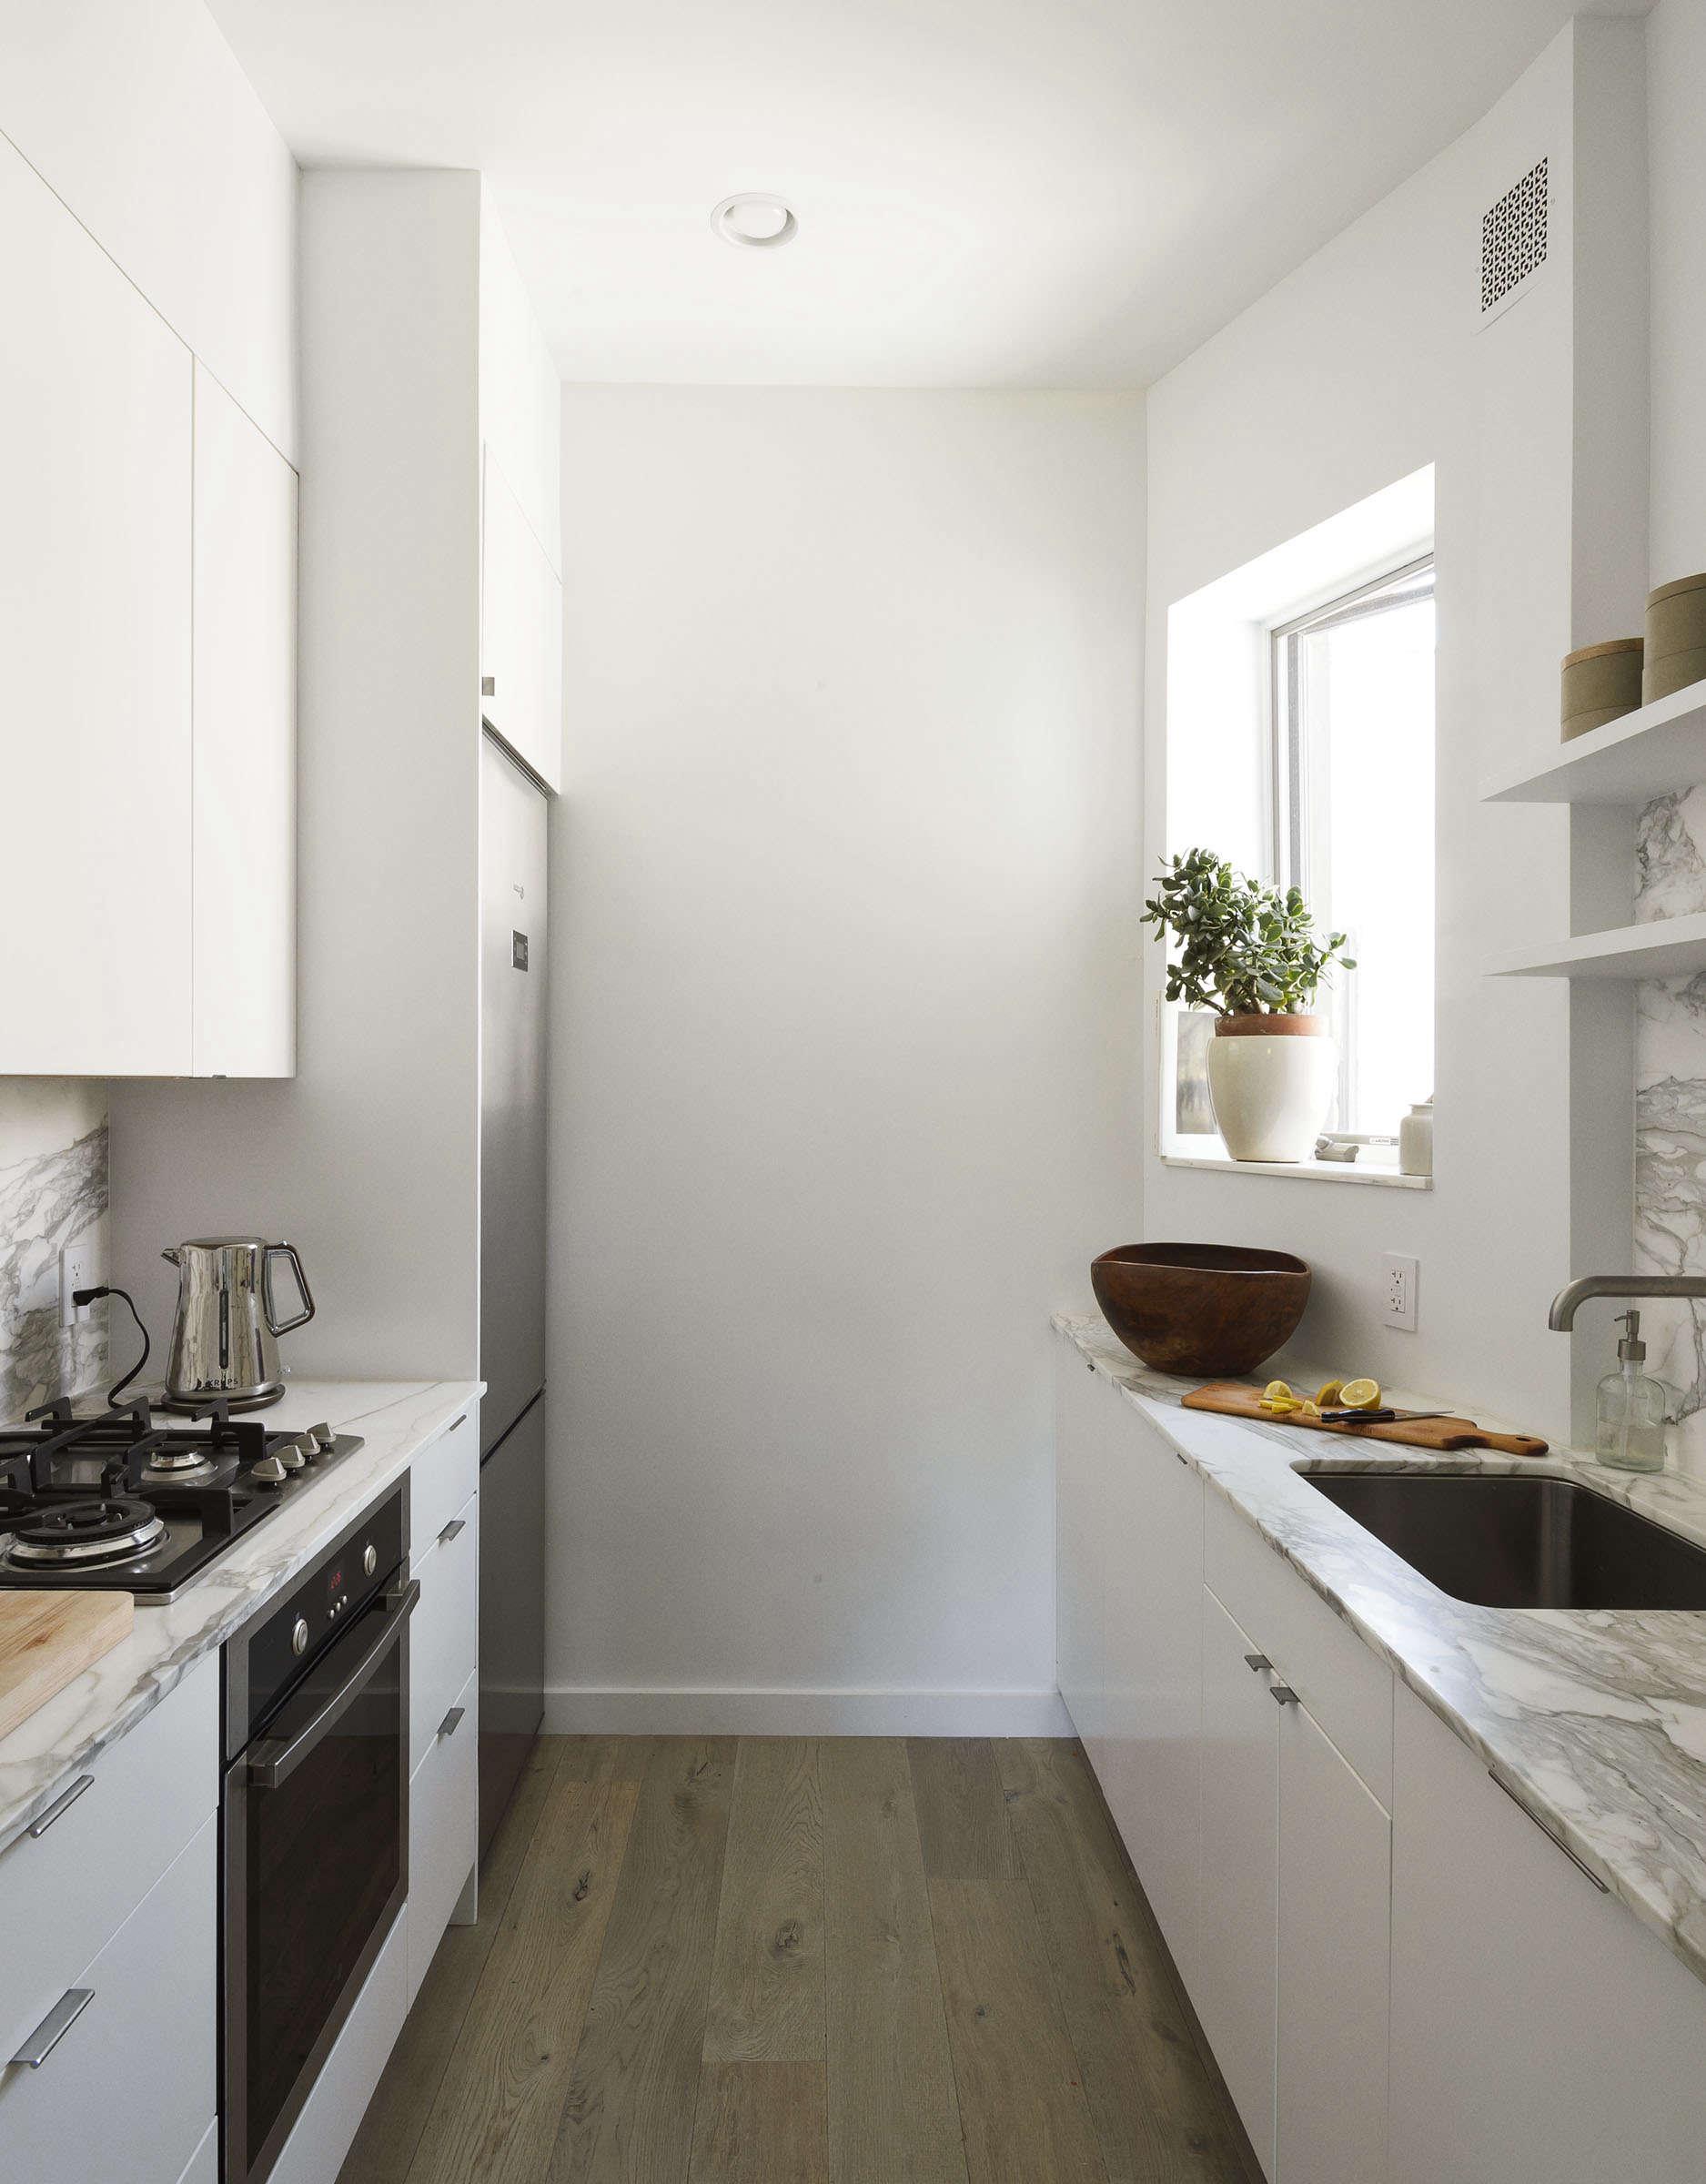 Ikea galley kitchen in Jacqueline-Schmidt and David Friedlander's 675-square-foot Brooklyn quarters, Matthew-Williams-photo | Remodelista